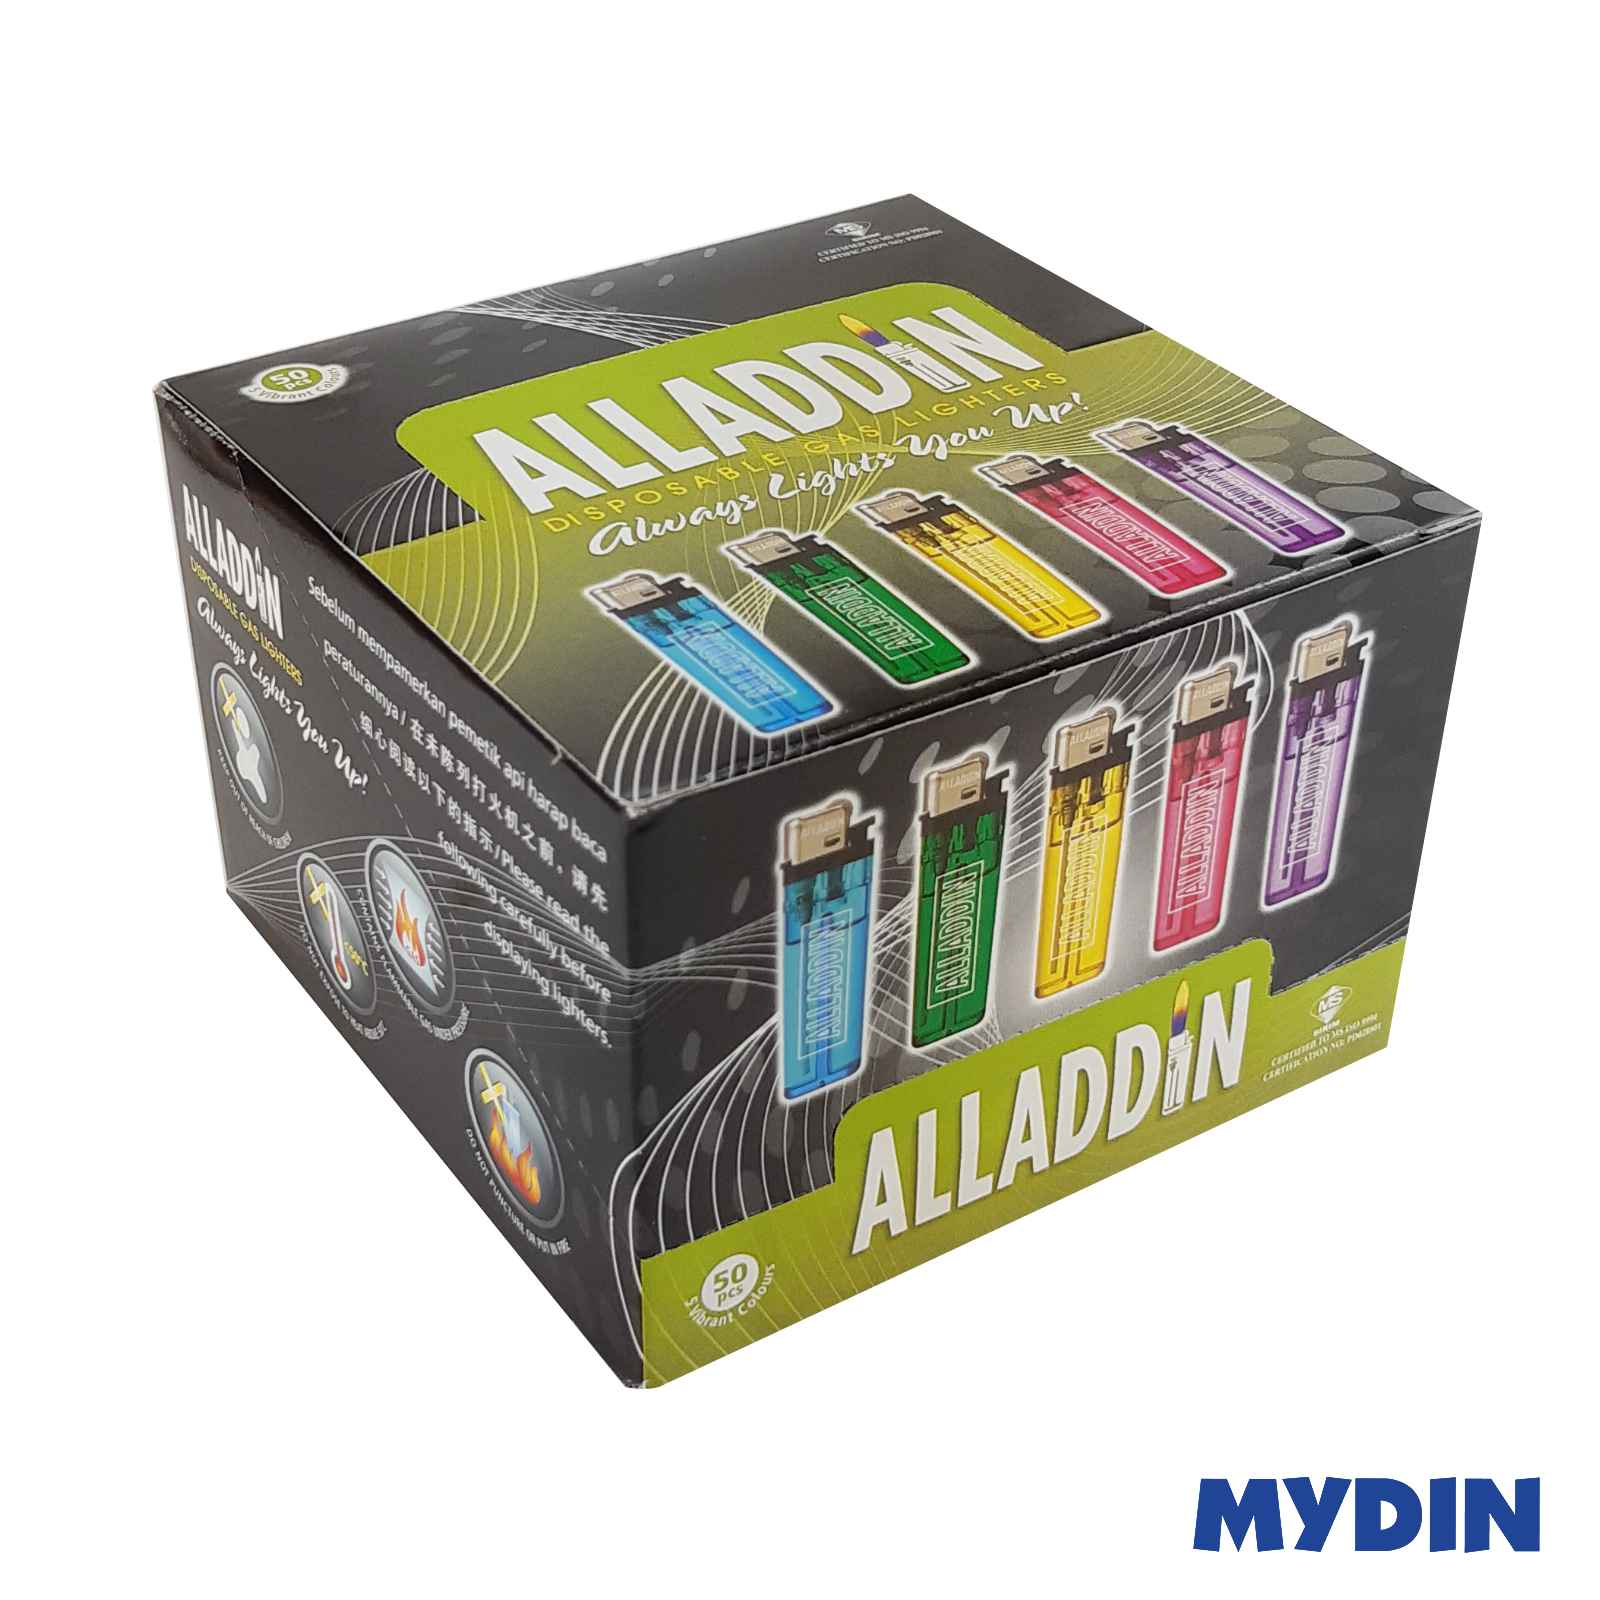 Alladin Disposable Lighter A001 (50pcs)